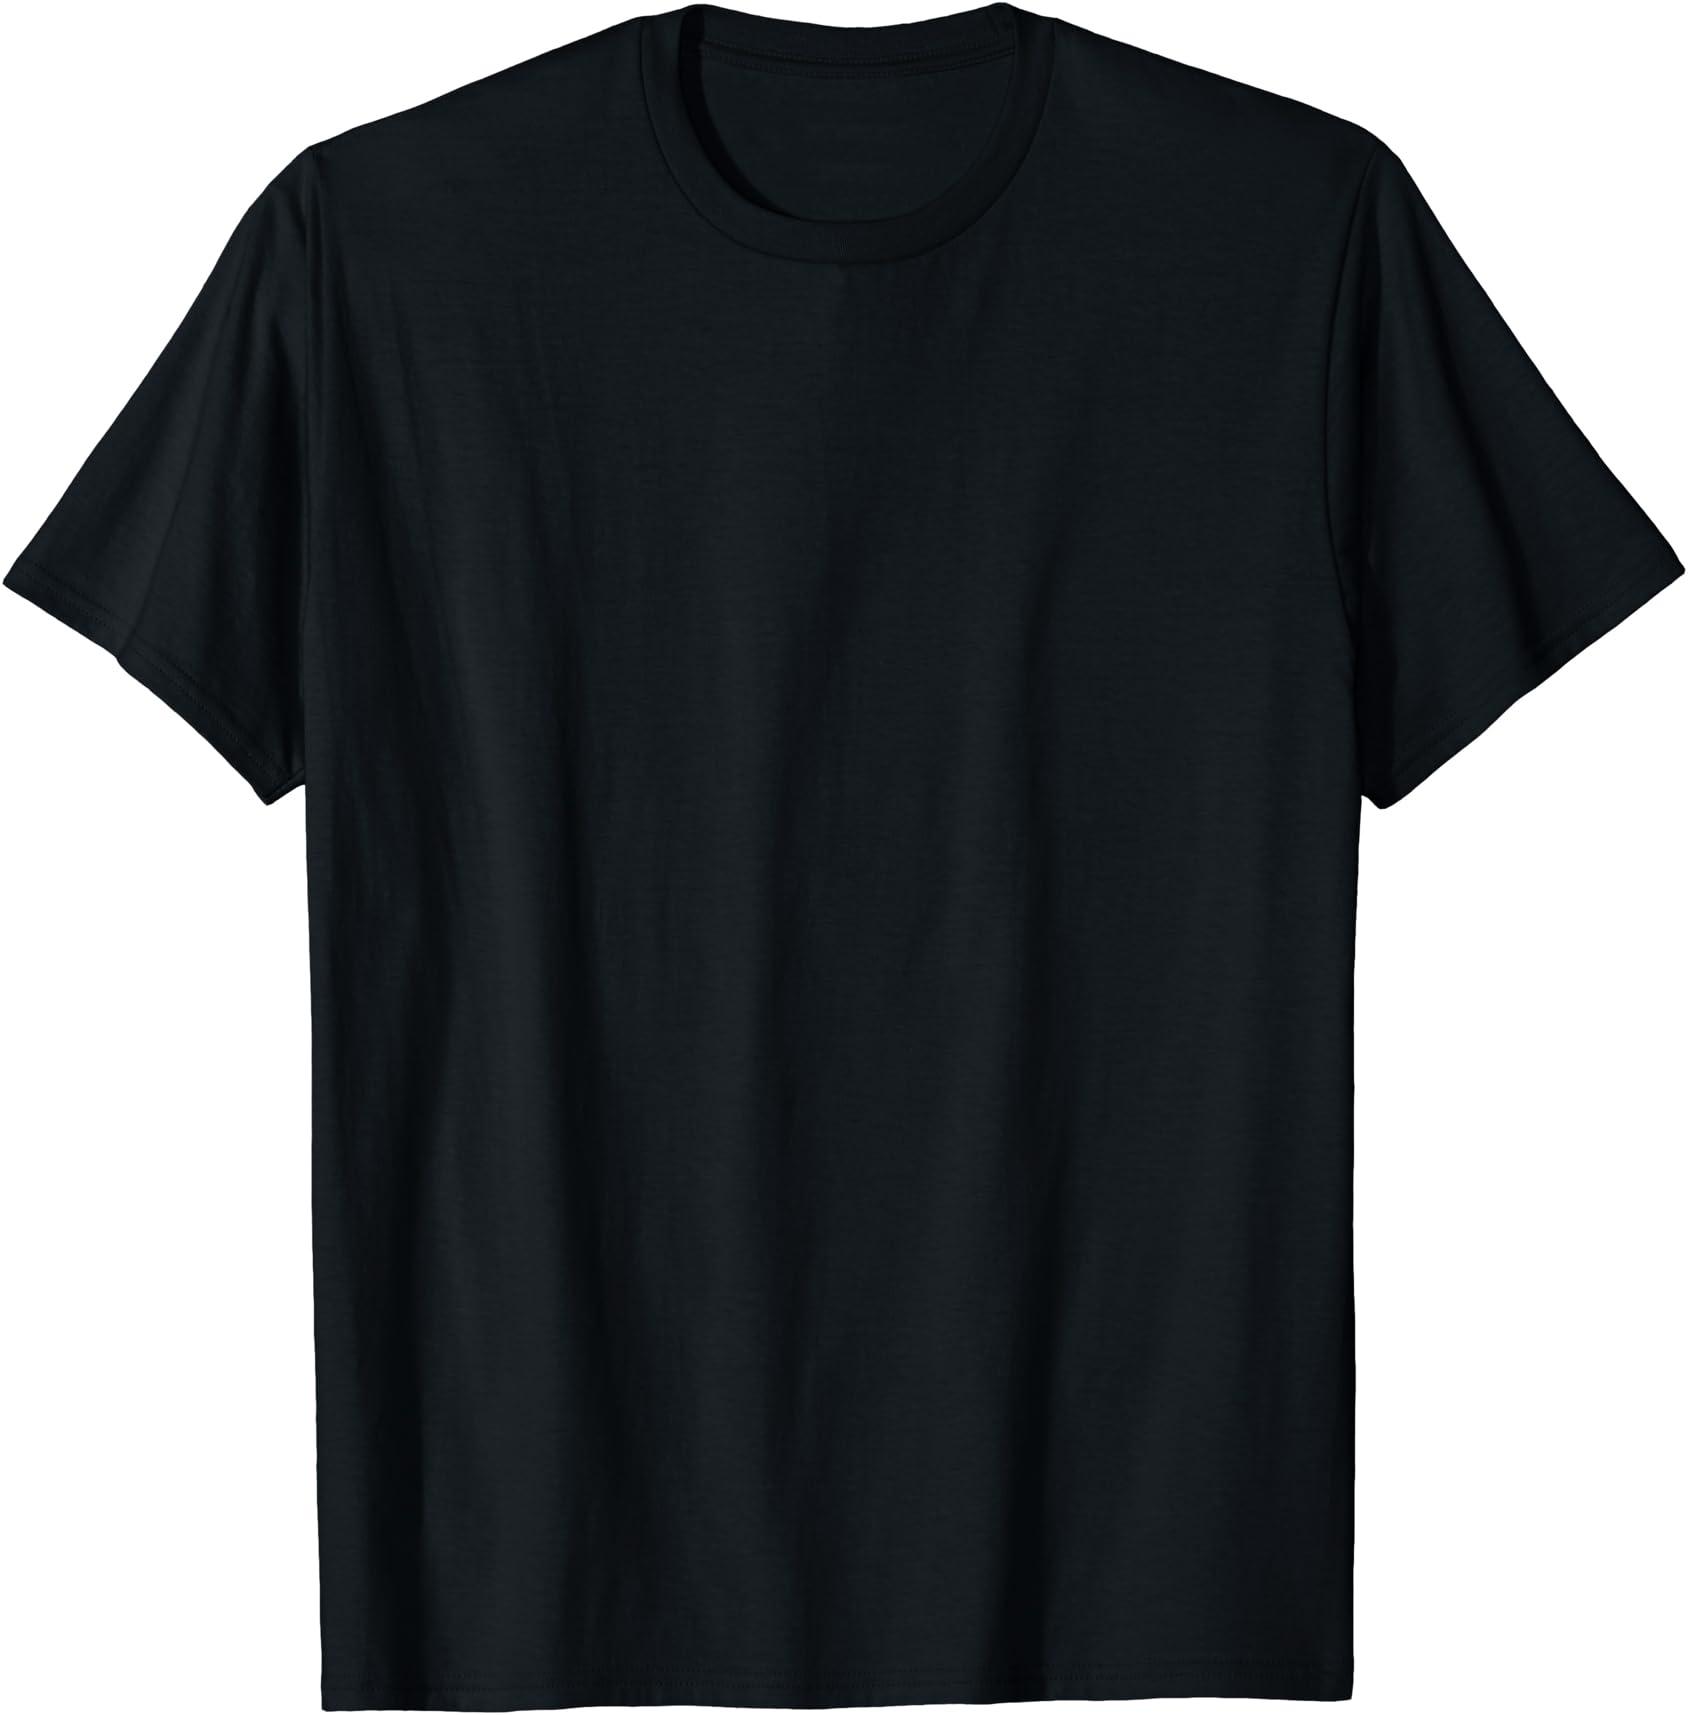 Batman Dark Knight Rises Costume Adult T-Shirt LICENSED DC COMICS